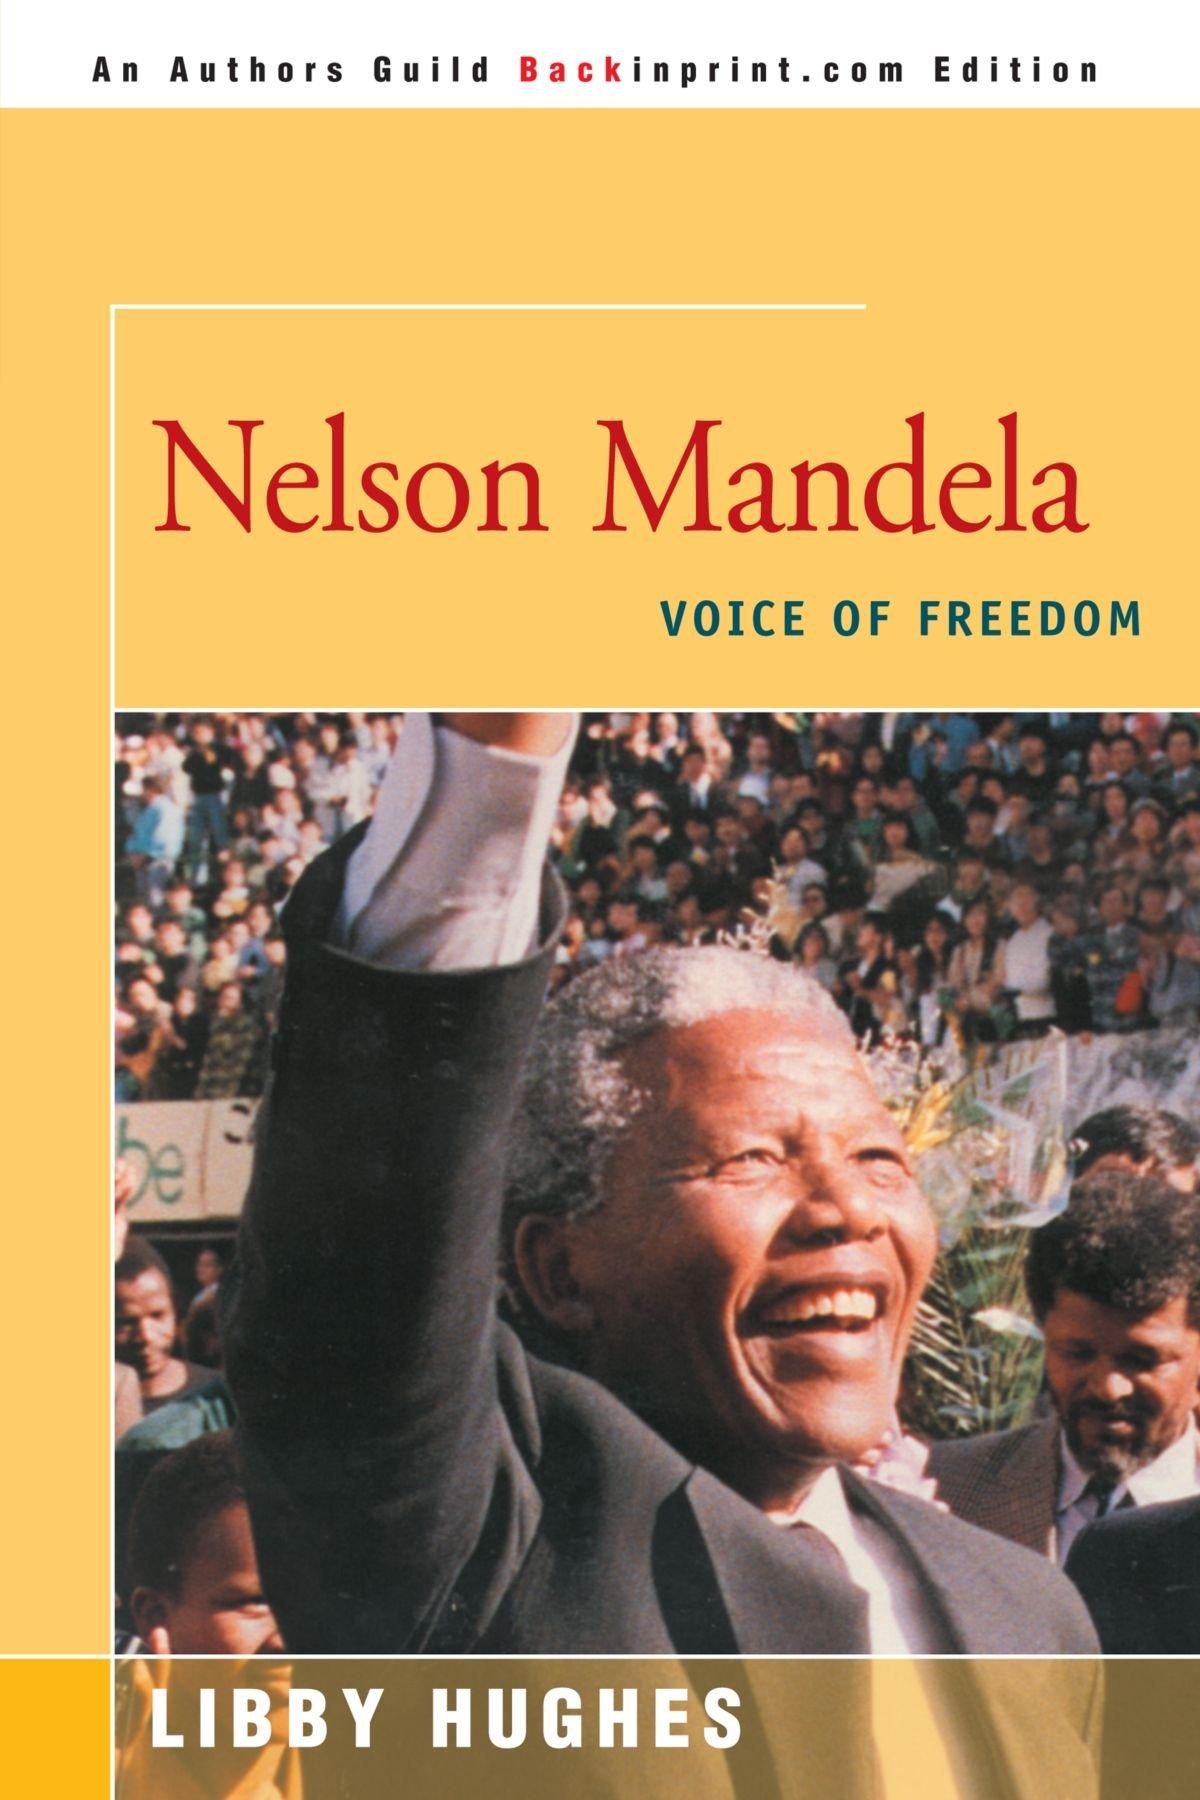 Nelson Mandela: Voice of Freedom